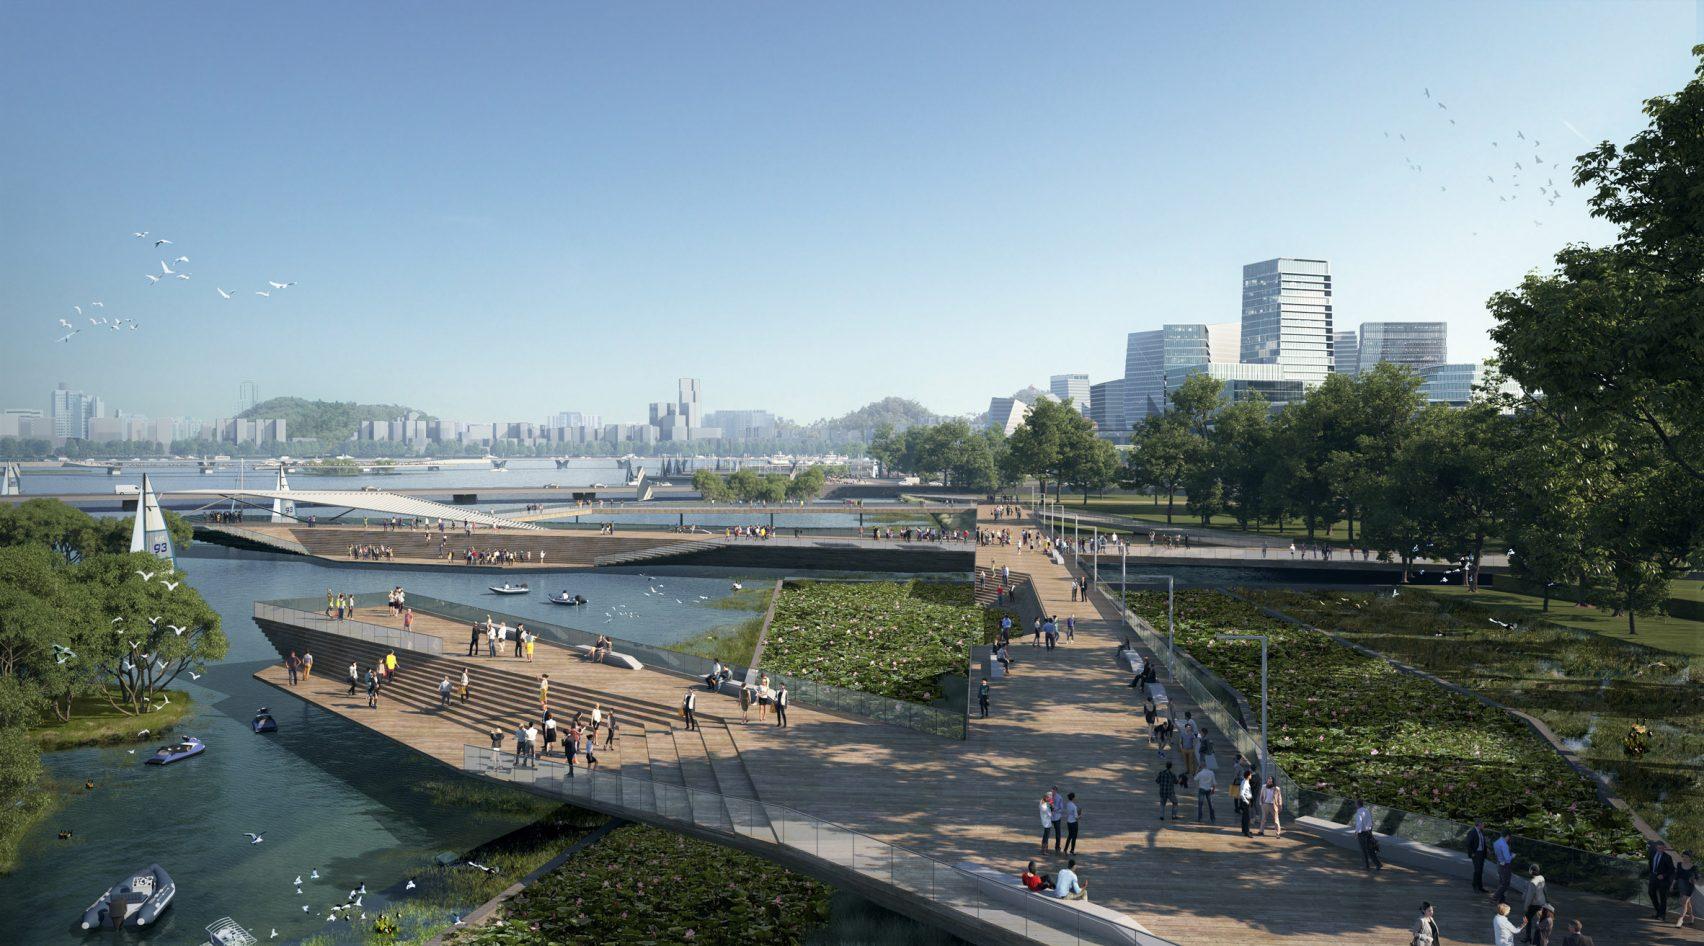 Net City, Kawasan Masa Depan Tanpa Mobil di Shenzhen